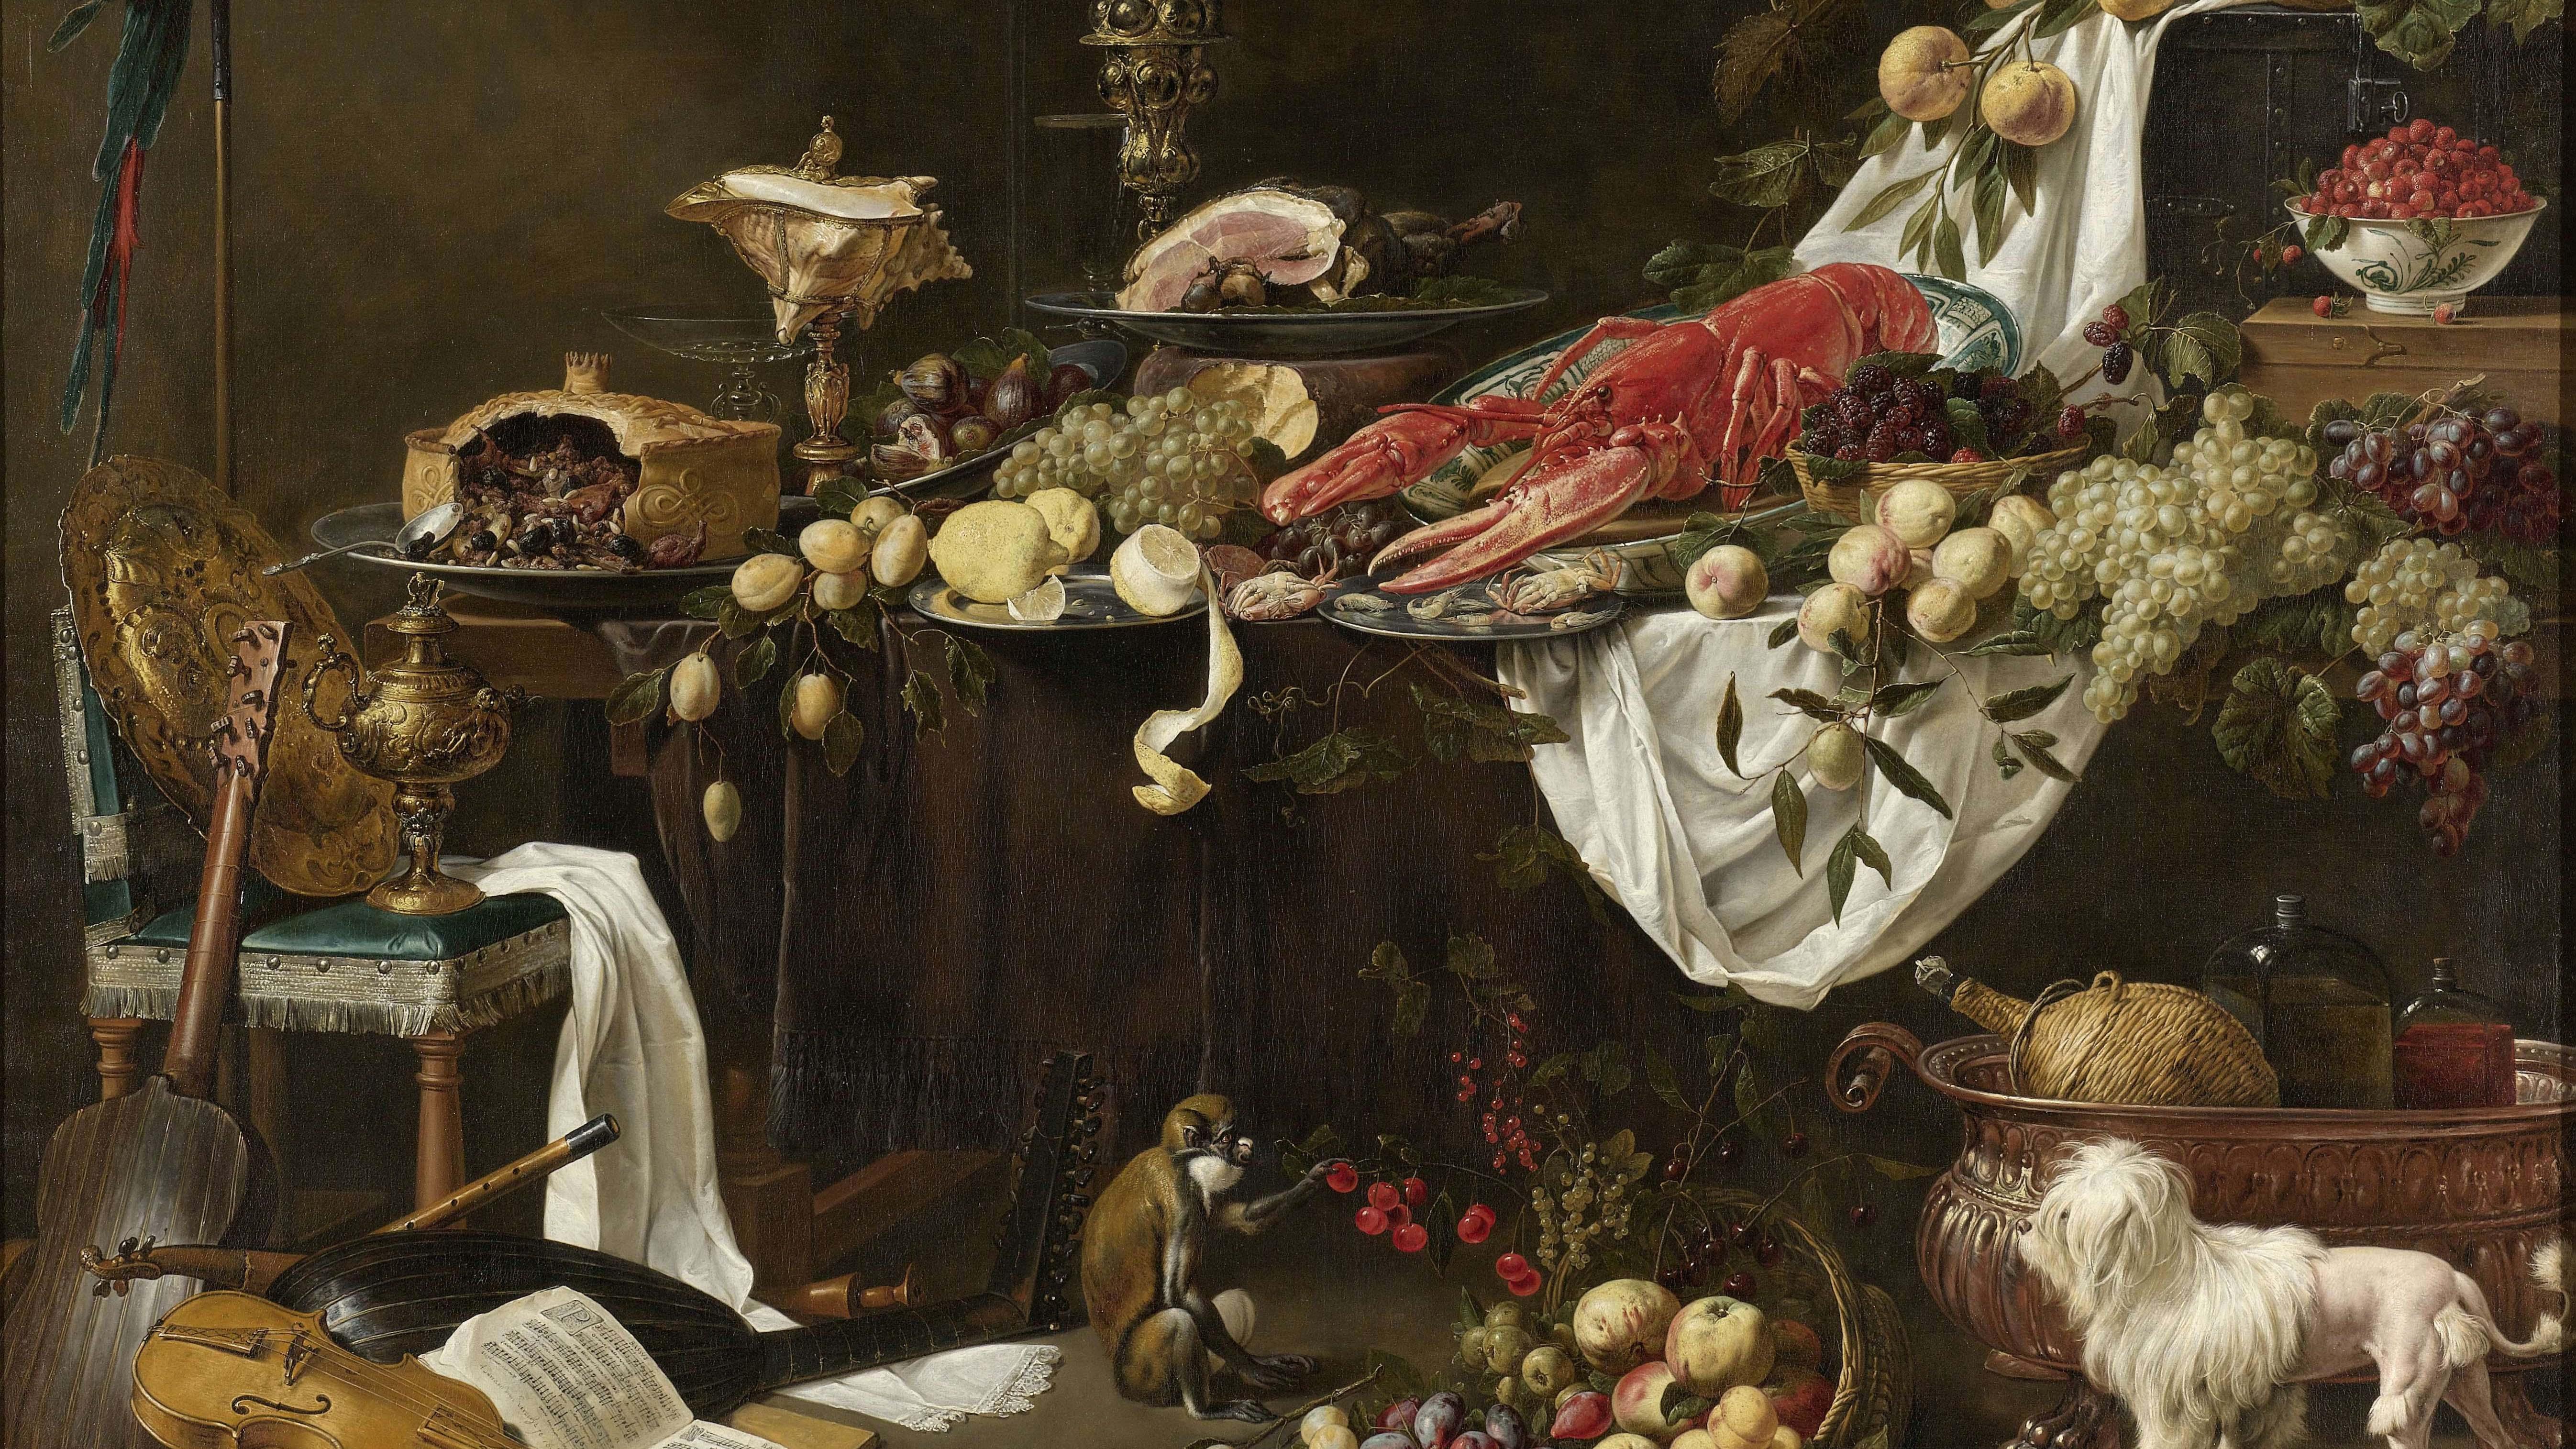 Adriaen van Utrecht, Bankett-Stillleben, 1644, Rijksmuseum; Foto: Wikimedia commons, gemeinfrei